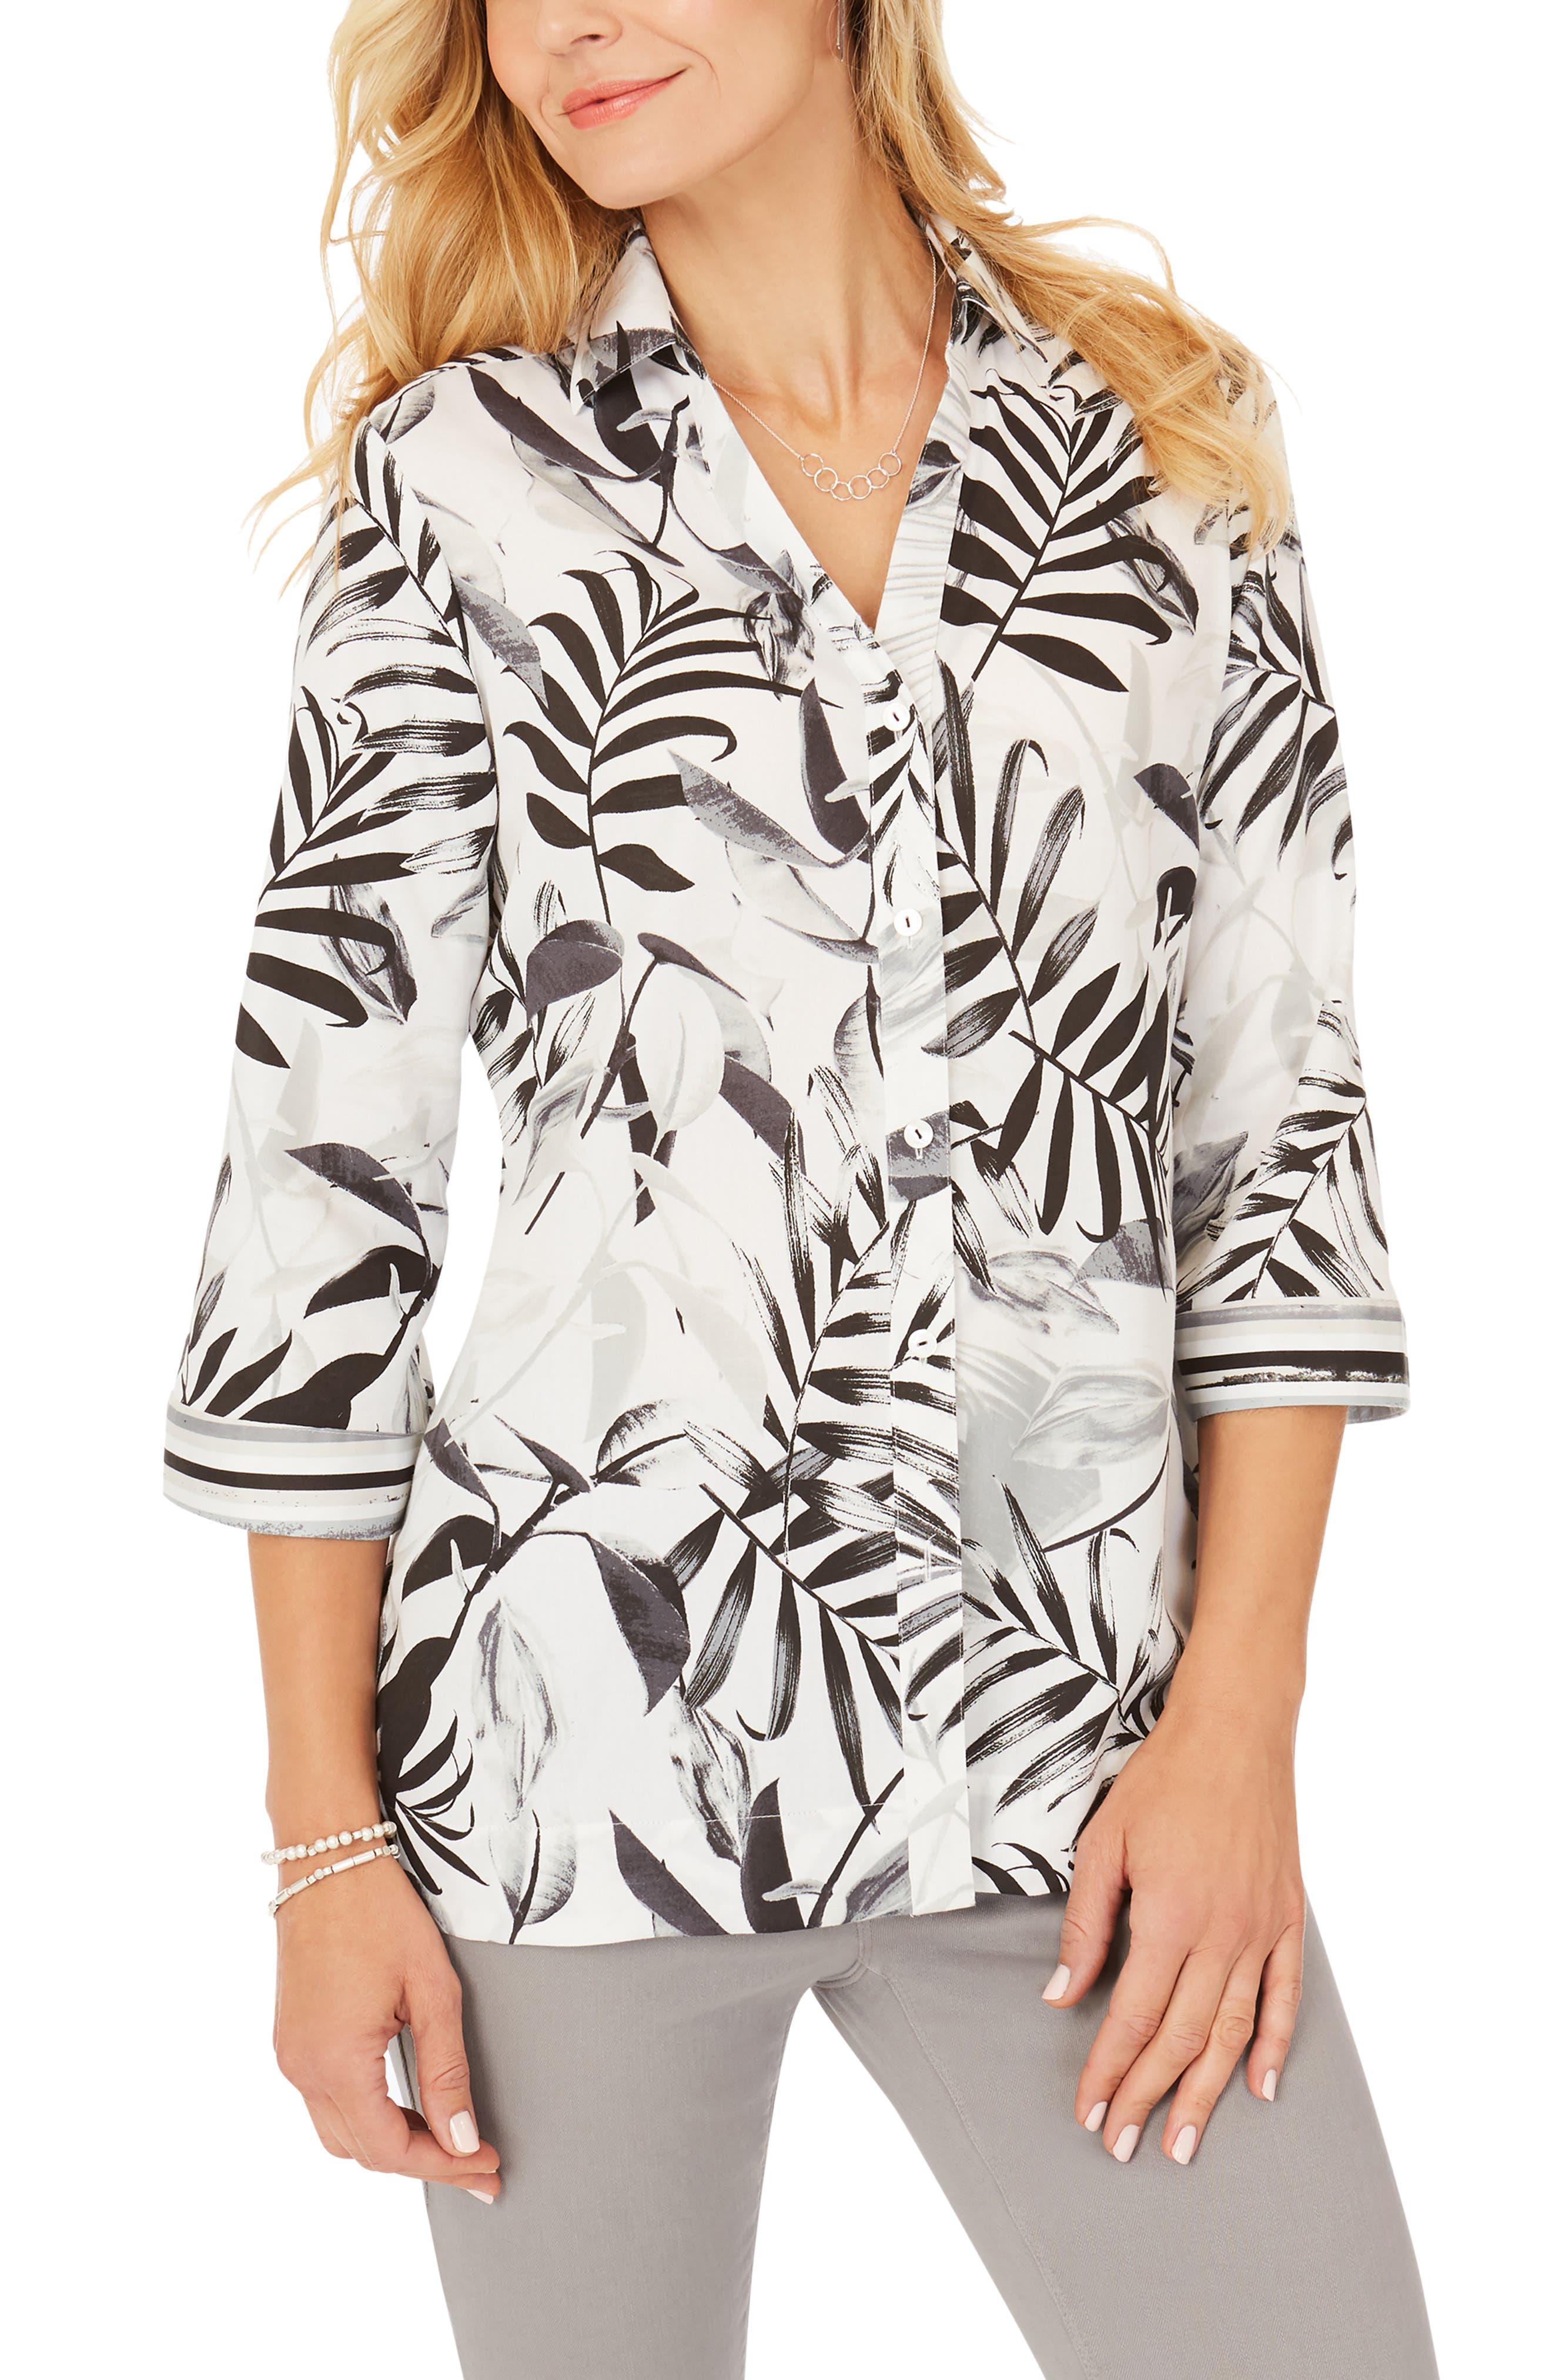 Liberty 34 Palms Wrinkle-Free Cotton Sateen Blouse